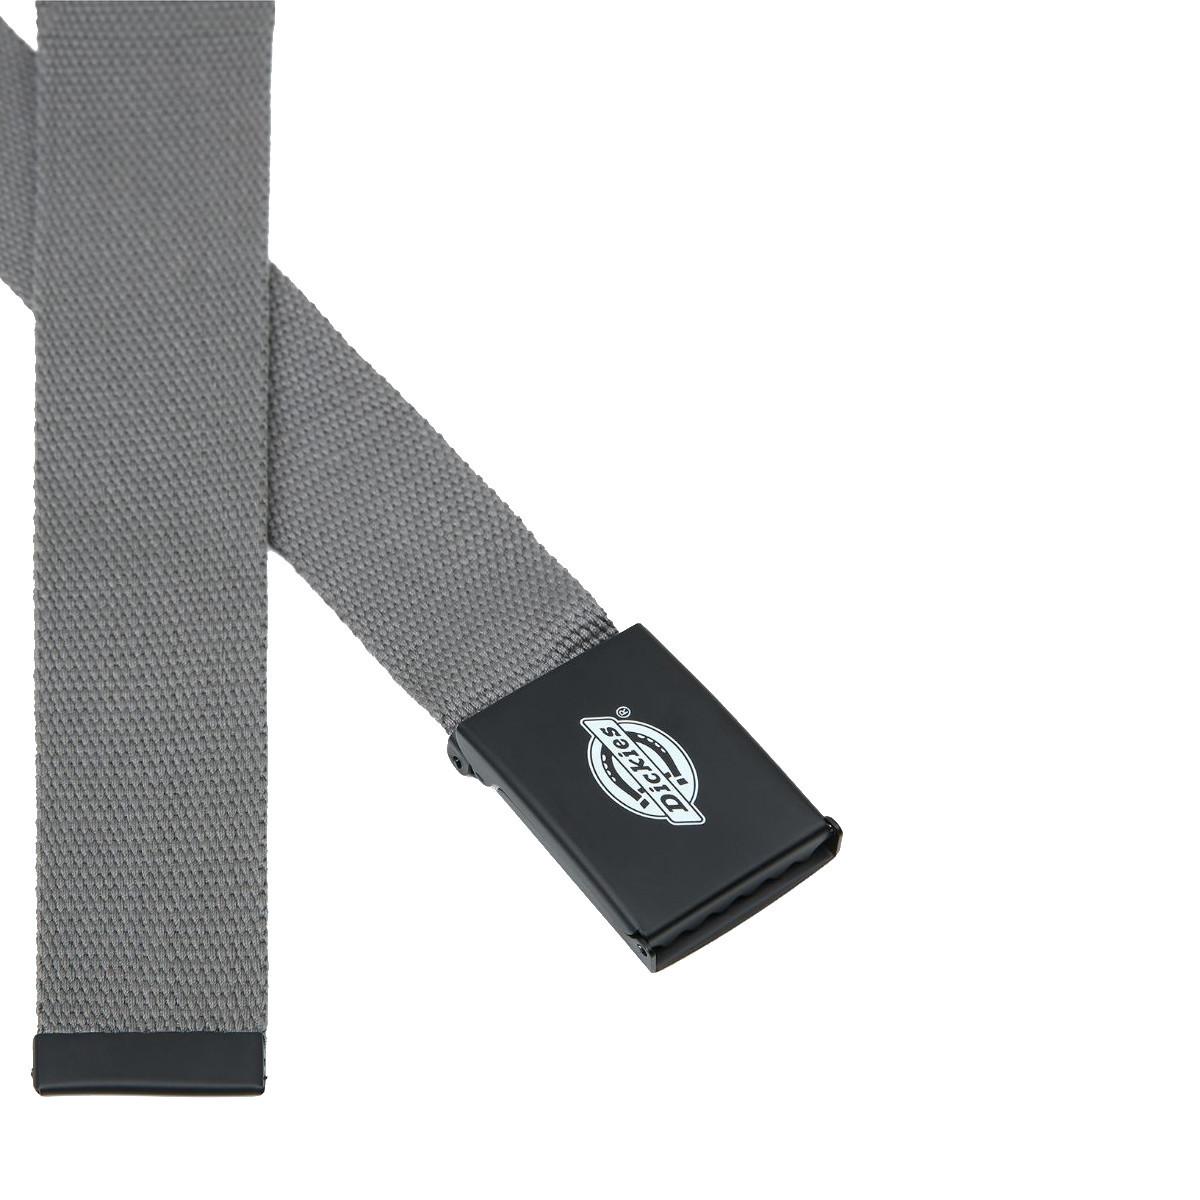 Ремень DICKIES Orcutt (Charcoal Grey)